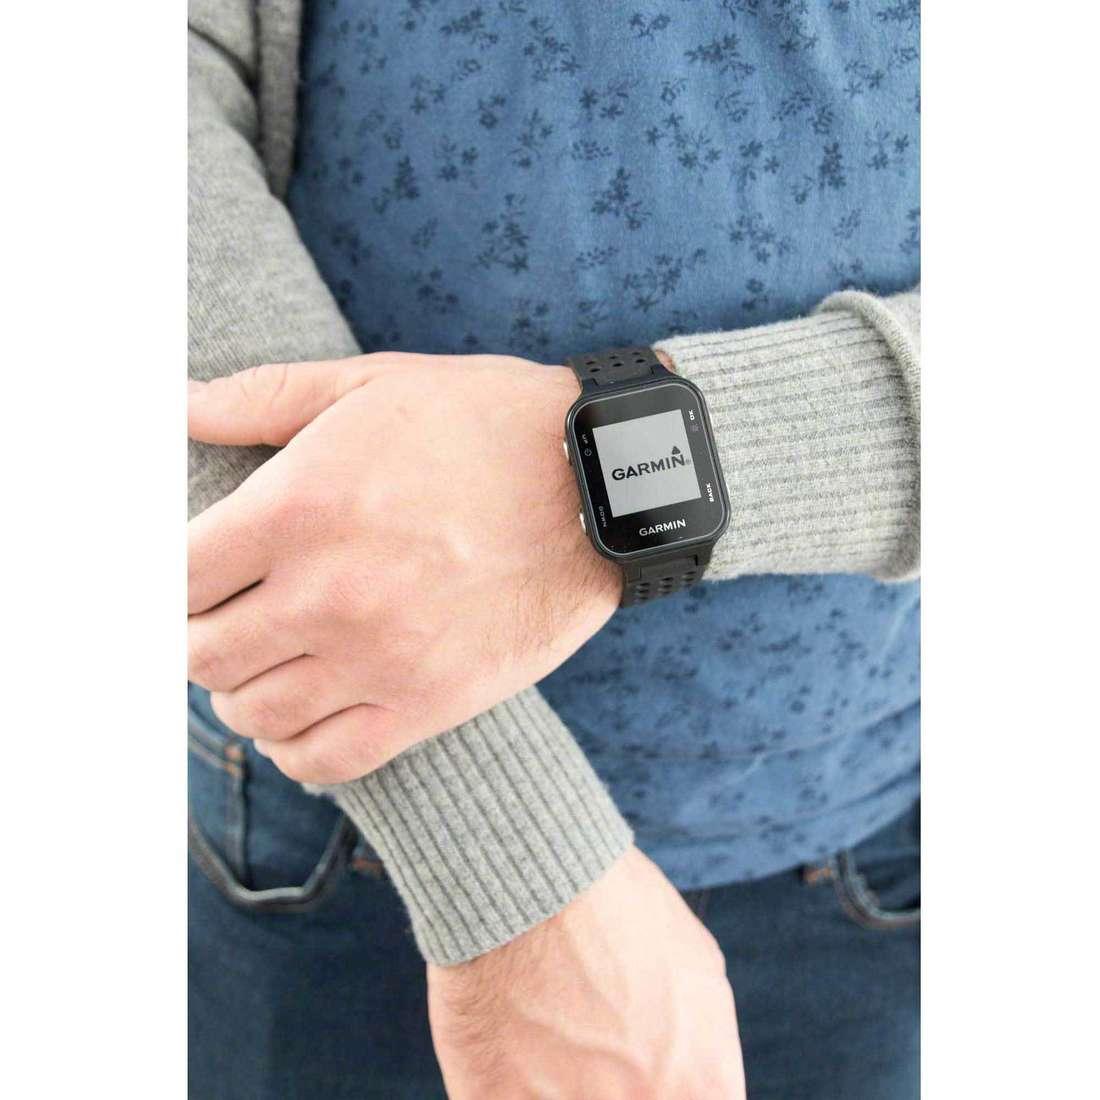 Garmin Smartwatches uomo 010-03723-01 indosso